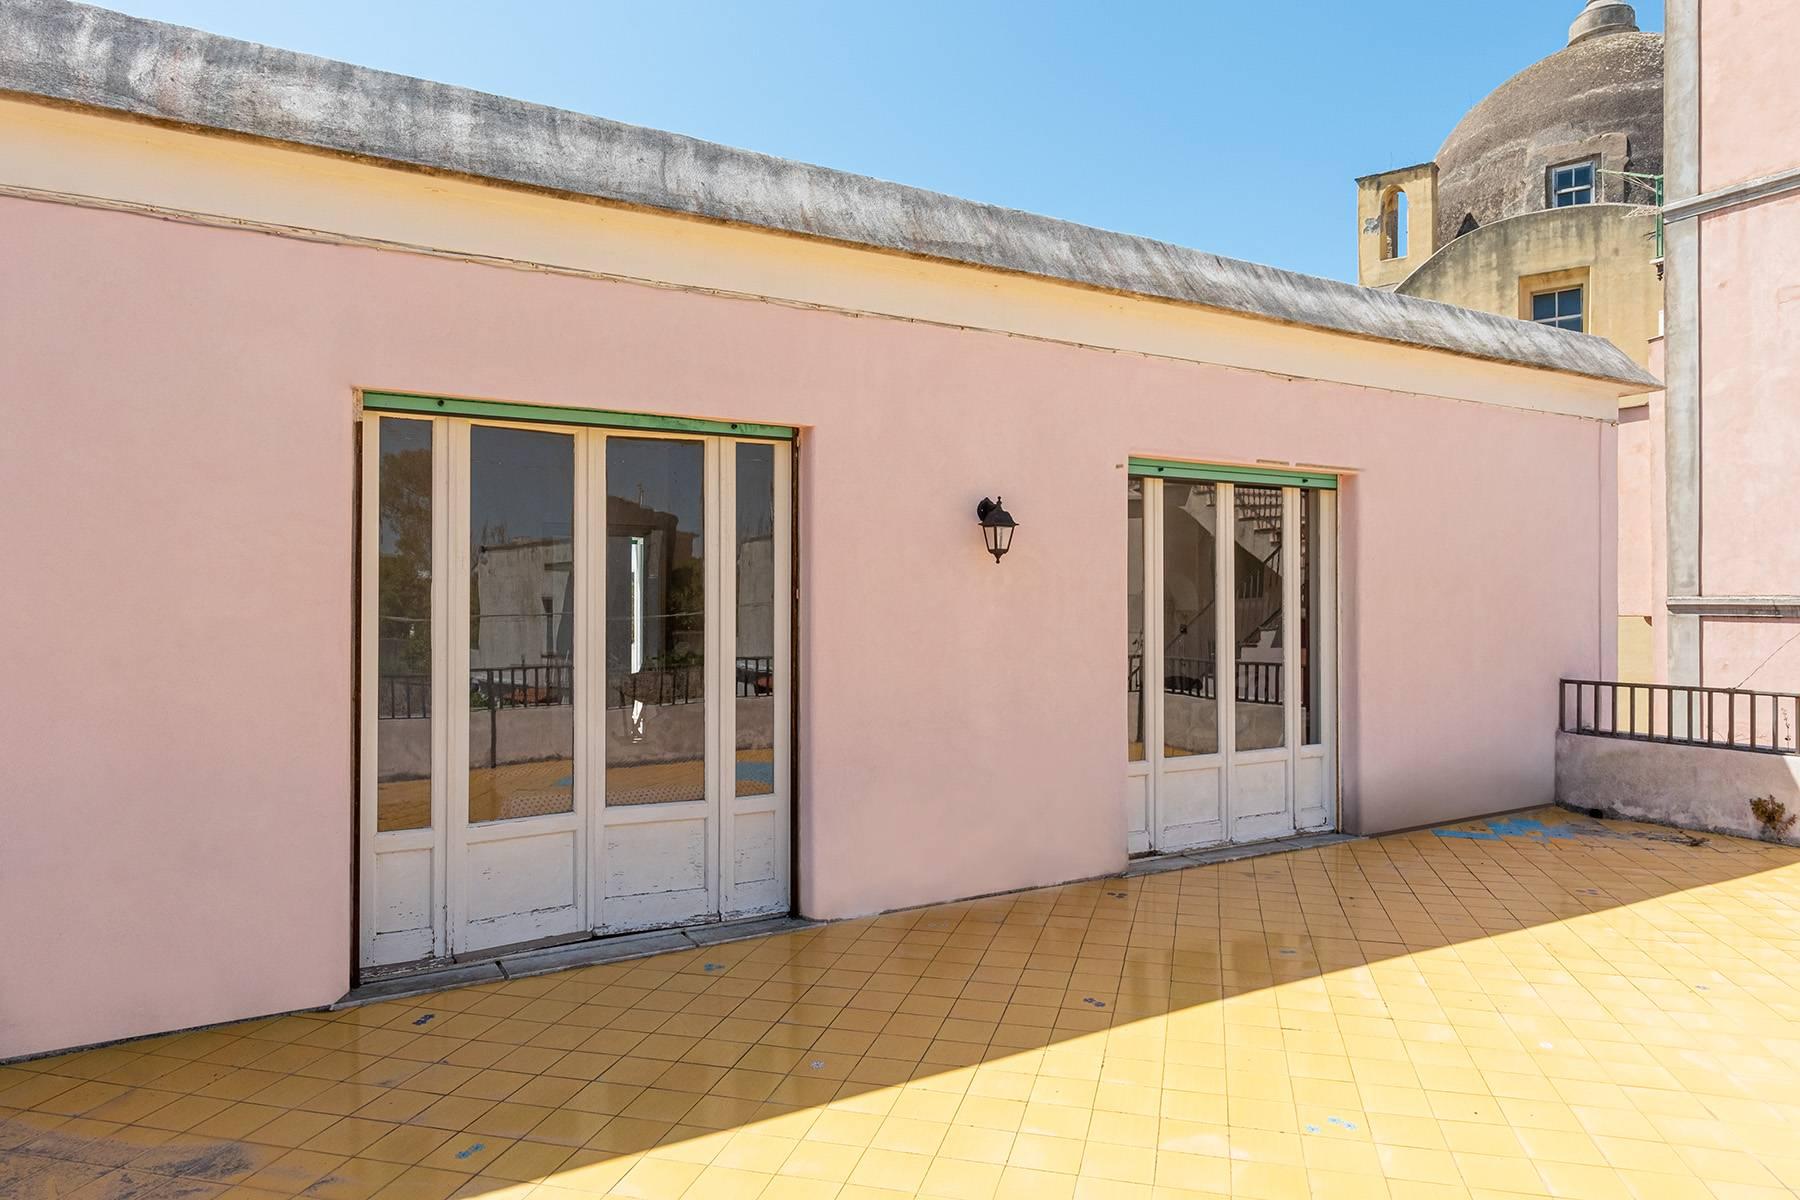 Casa indipendente in Vendita a Procida: 5 locali, 300 mq - Foto 16